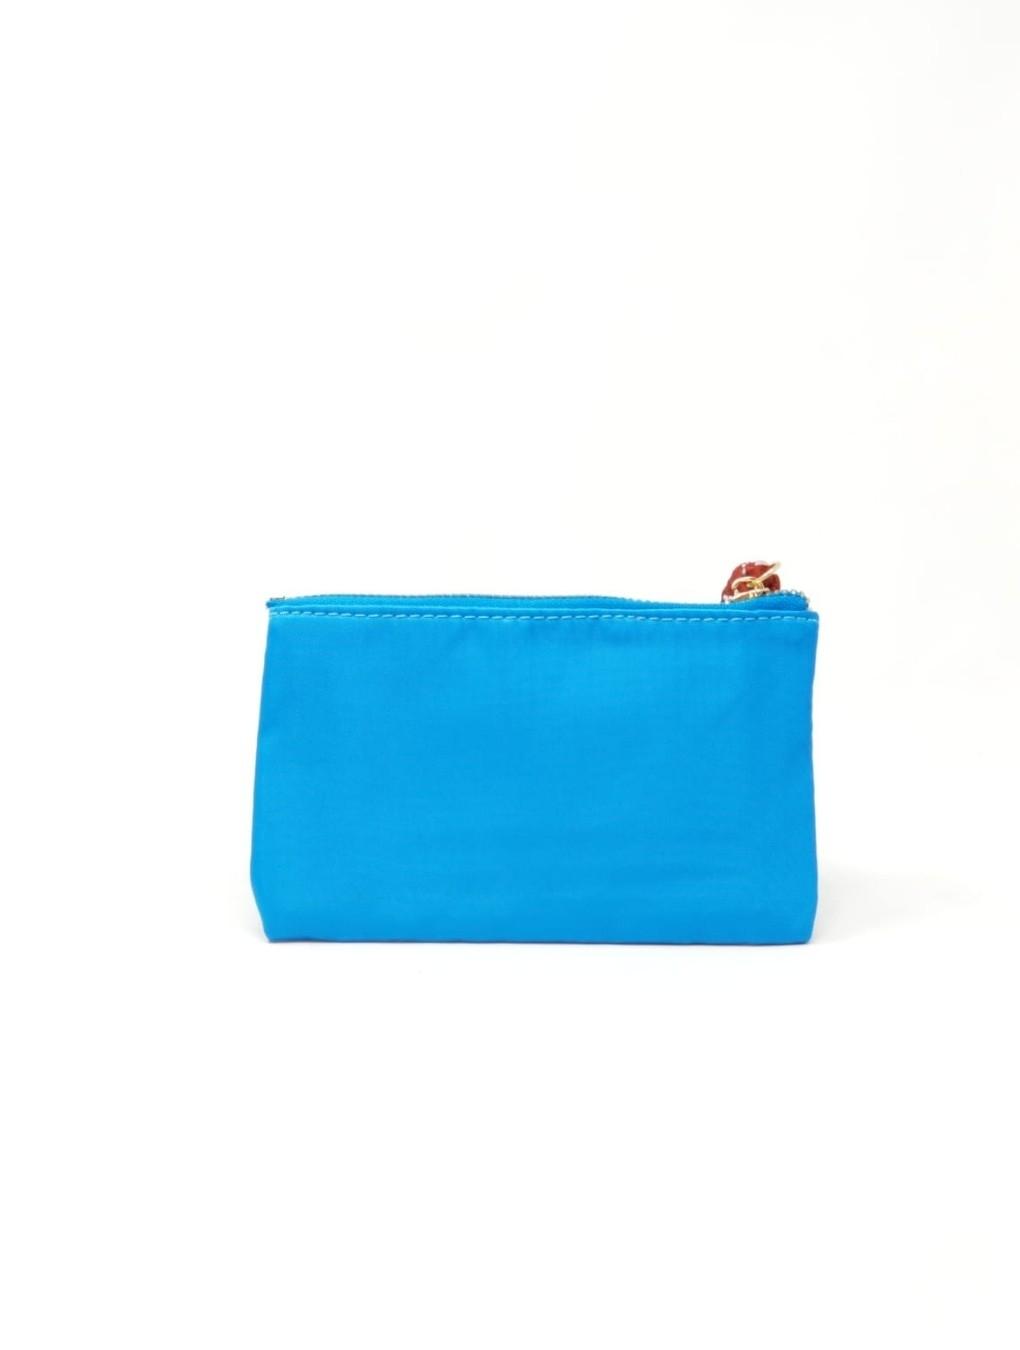 JIE PURSE - TURQUOISE BLUE